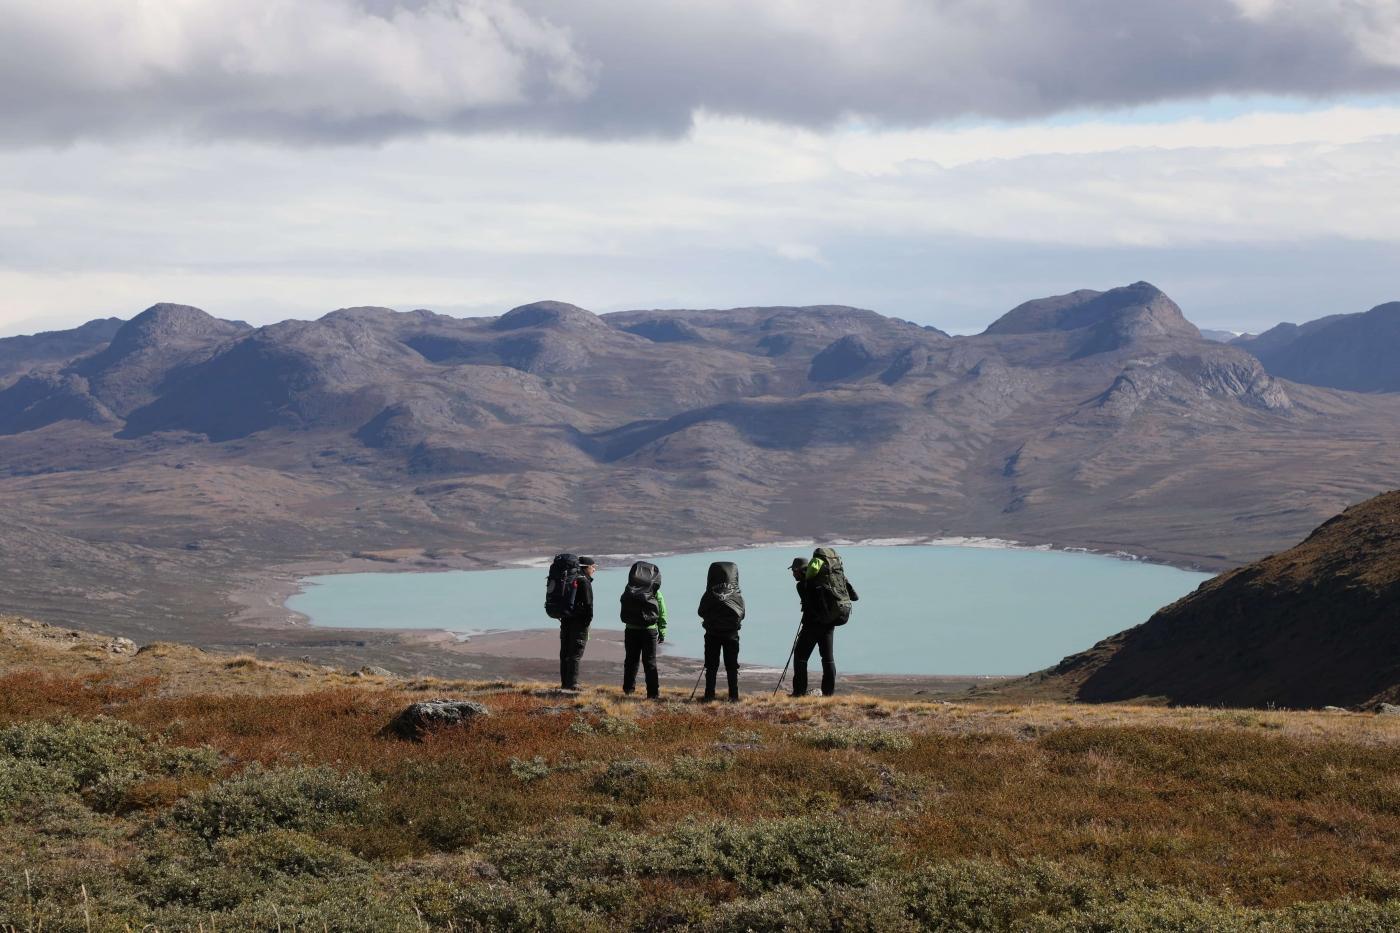 Hikers in Aasivissuit UNESCO area close to Kangerlussuaq Photo by Morten Christensen - Visit Greenland